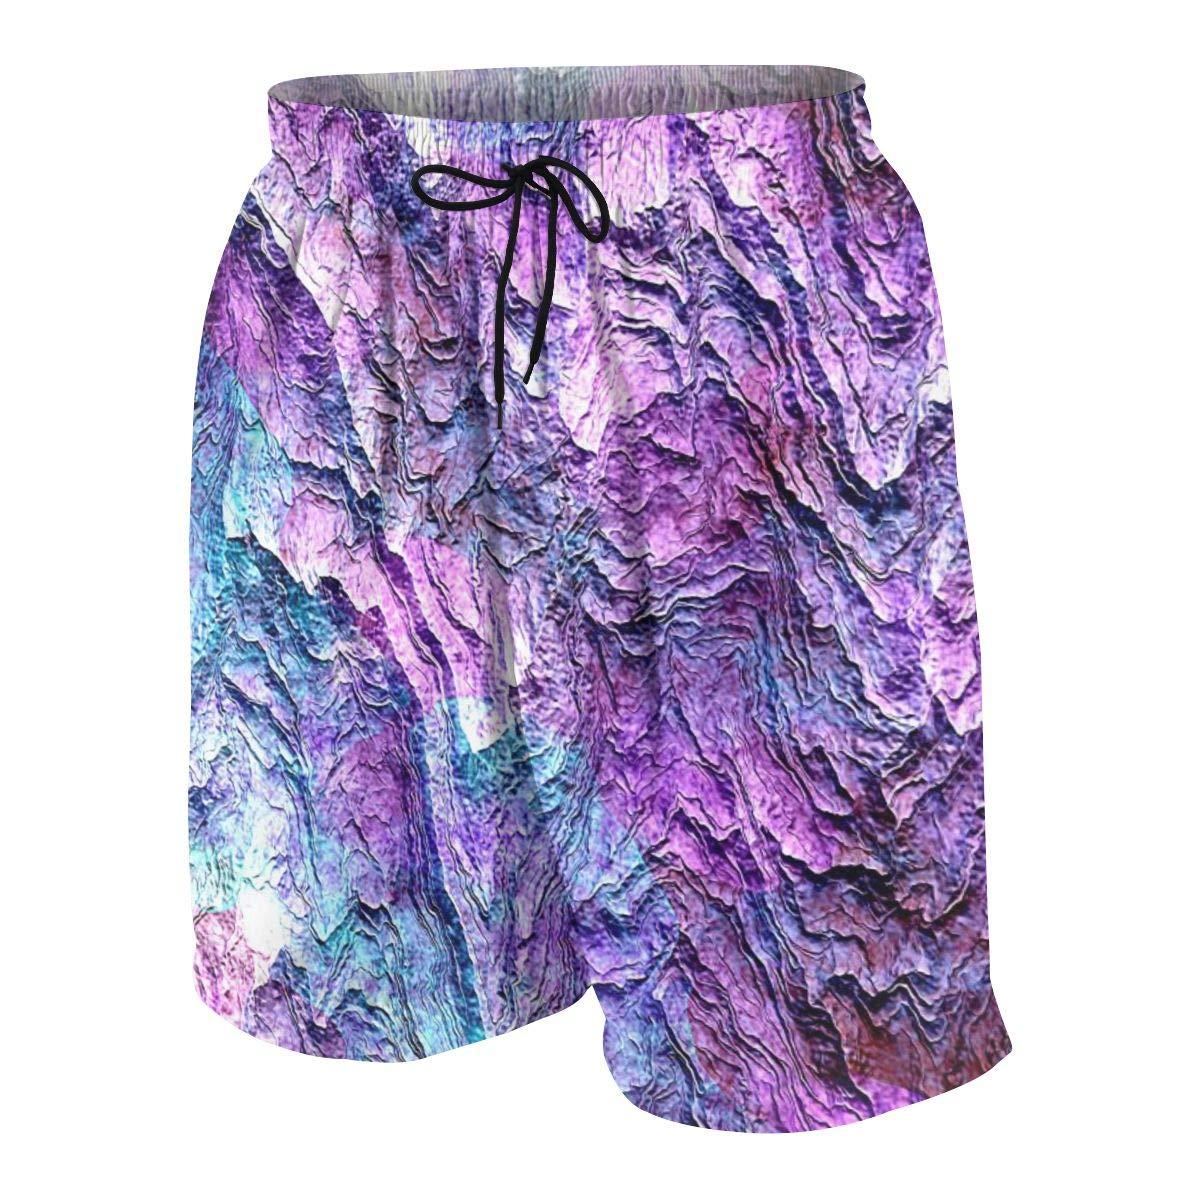 Rigg-pants Youth Comfortable Hawaii Surfing Camping Fashion Beach Shorts Swim Trunks Board Shorts